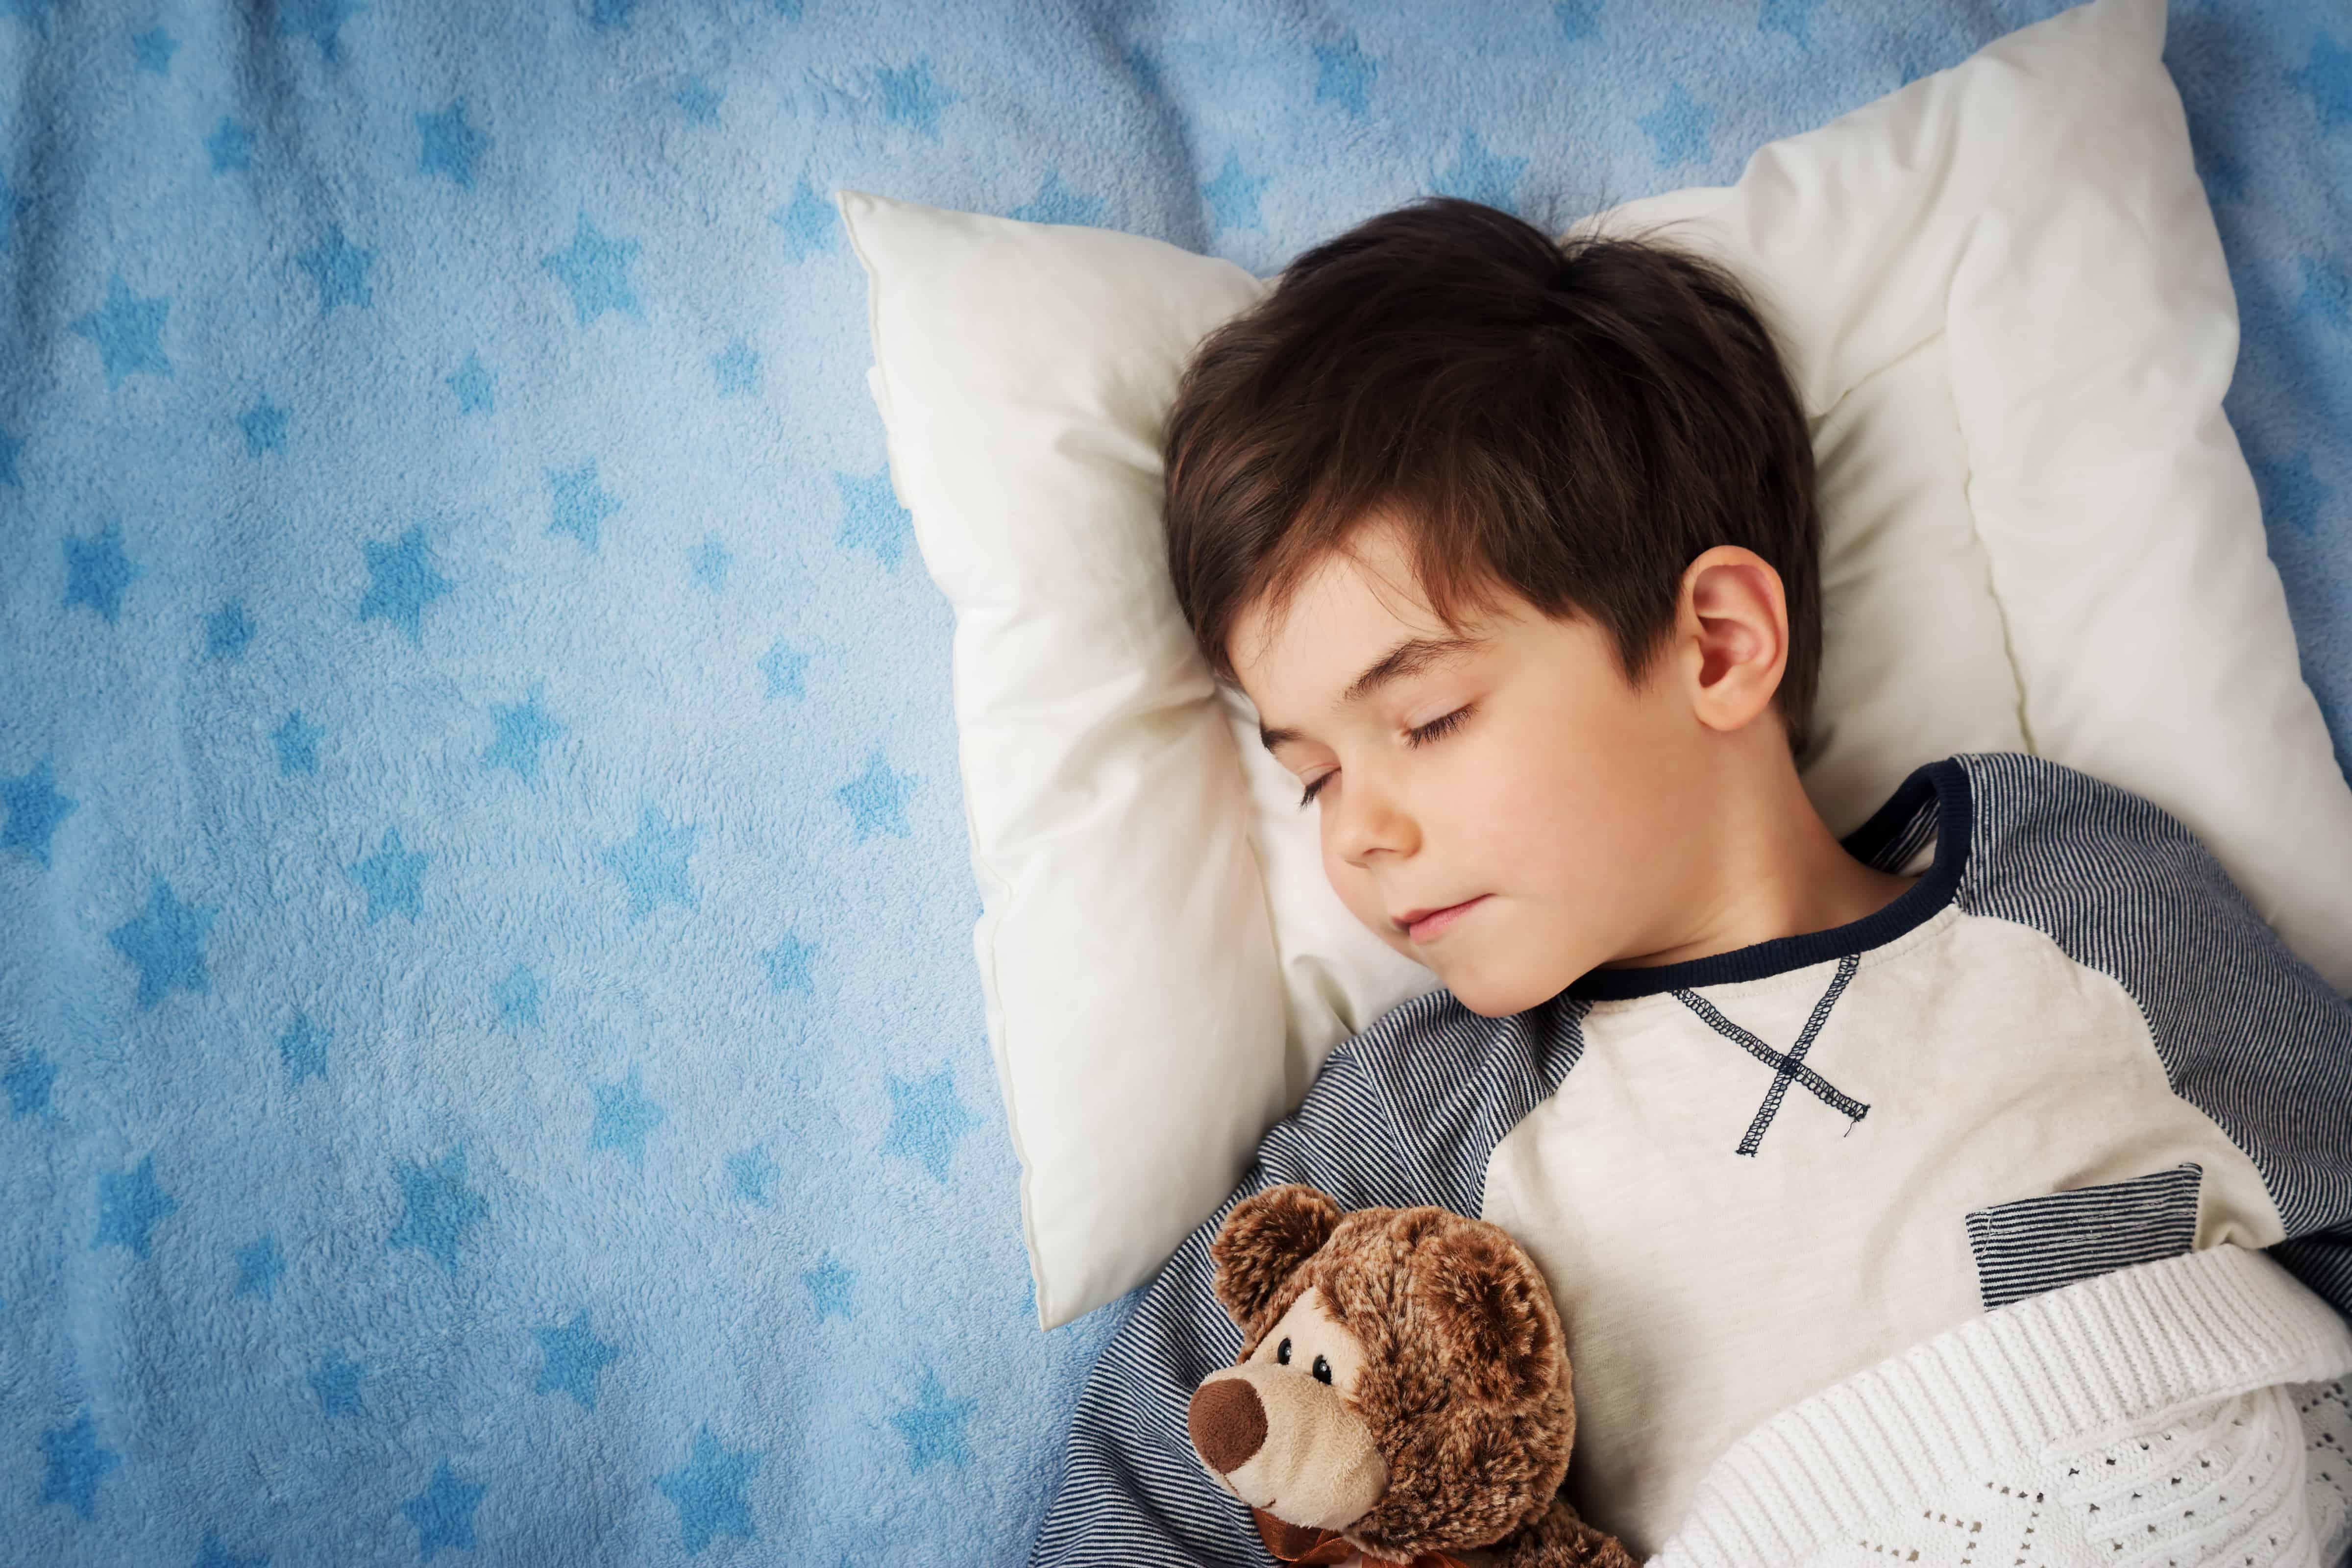 Can Orthodontics Actually Help You Sleep Better Too?